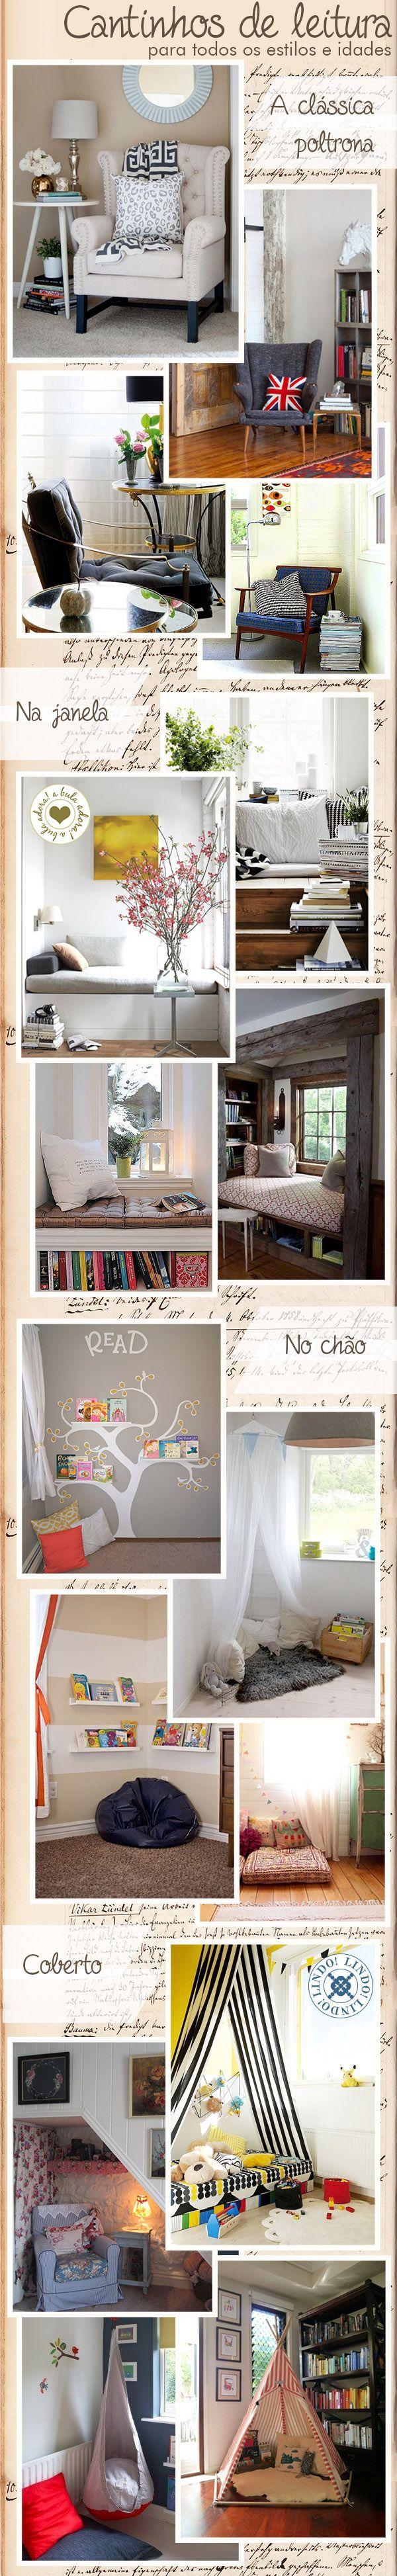 best casa decor images on pinterest dinner room furniture